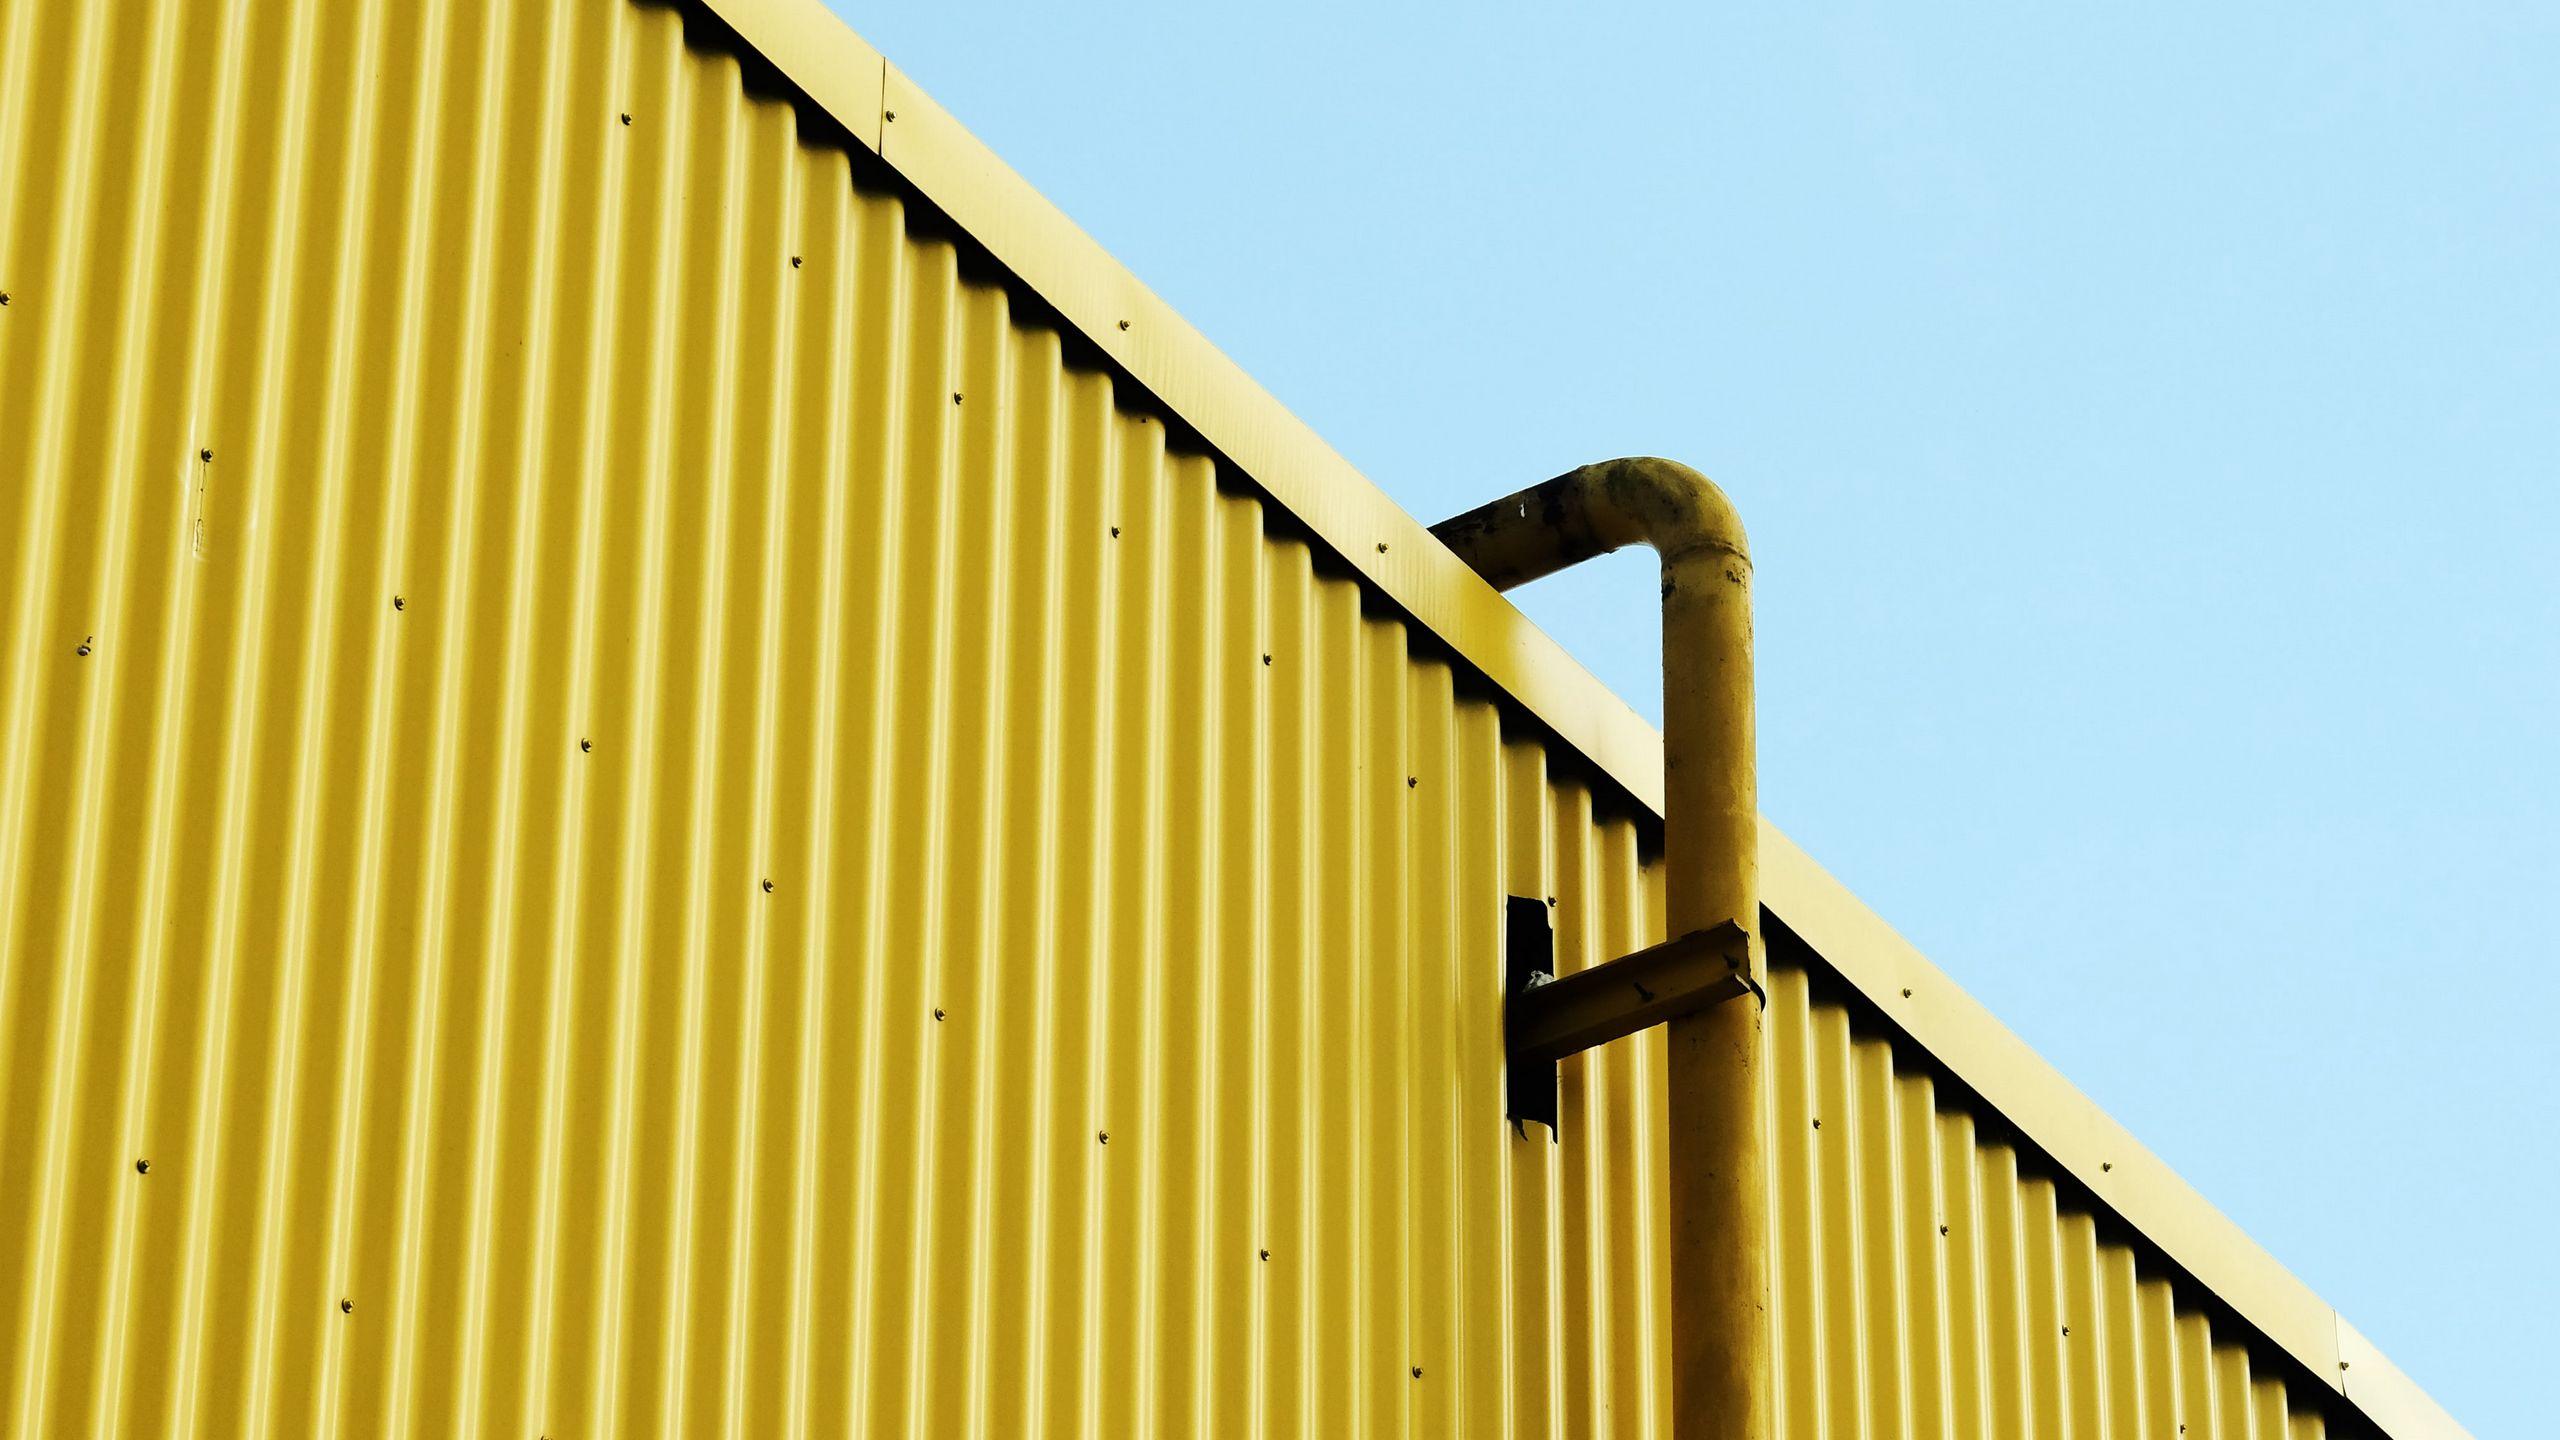 2560x1440 Wallpaper building, pipe, yellow, minimalism